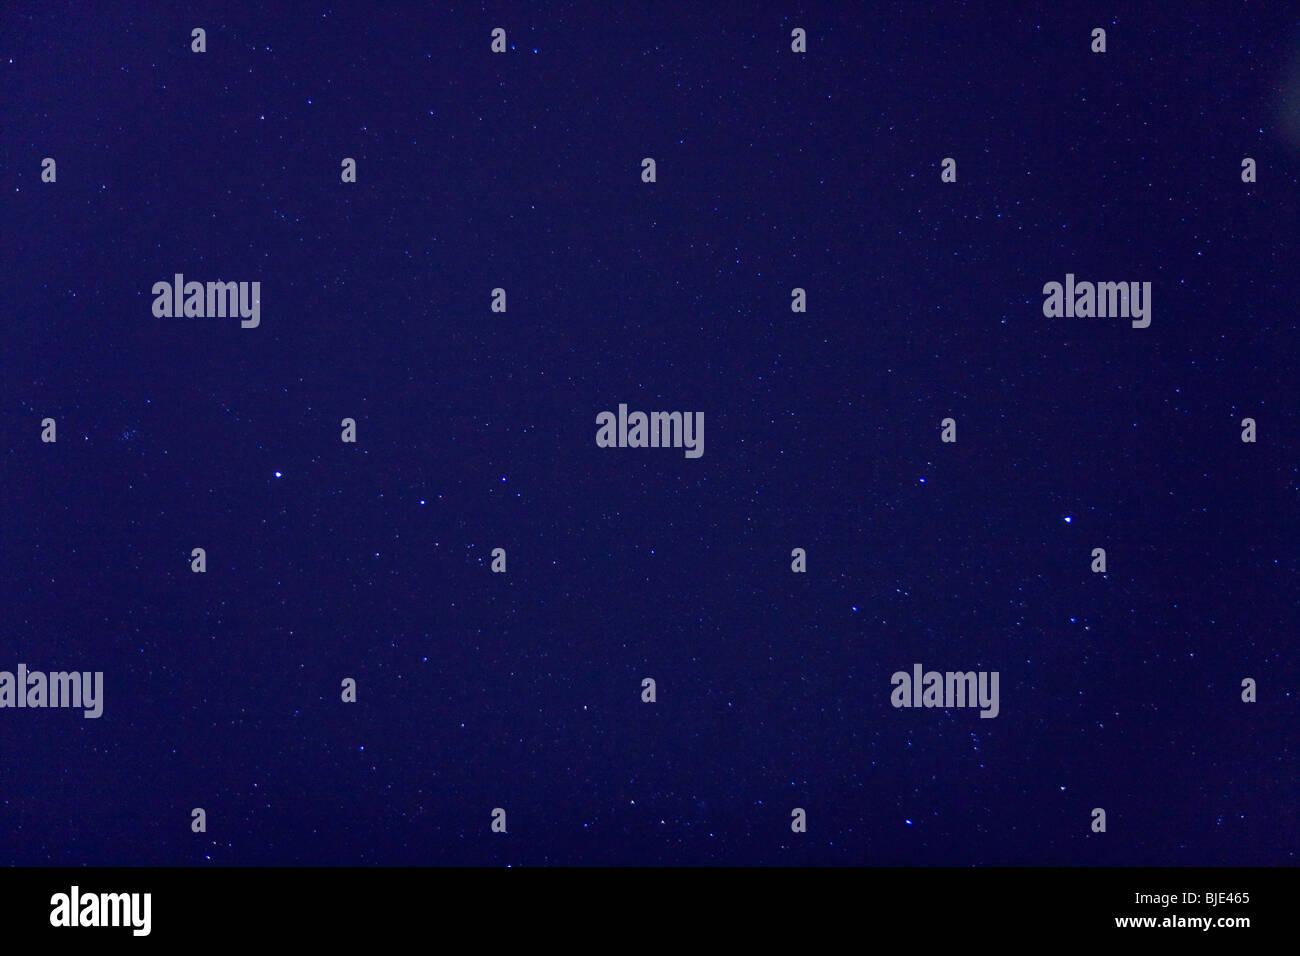 Stars on a clear, dark blue, night sky. - Stock Image